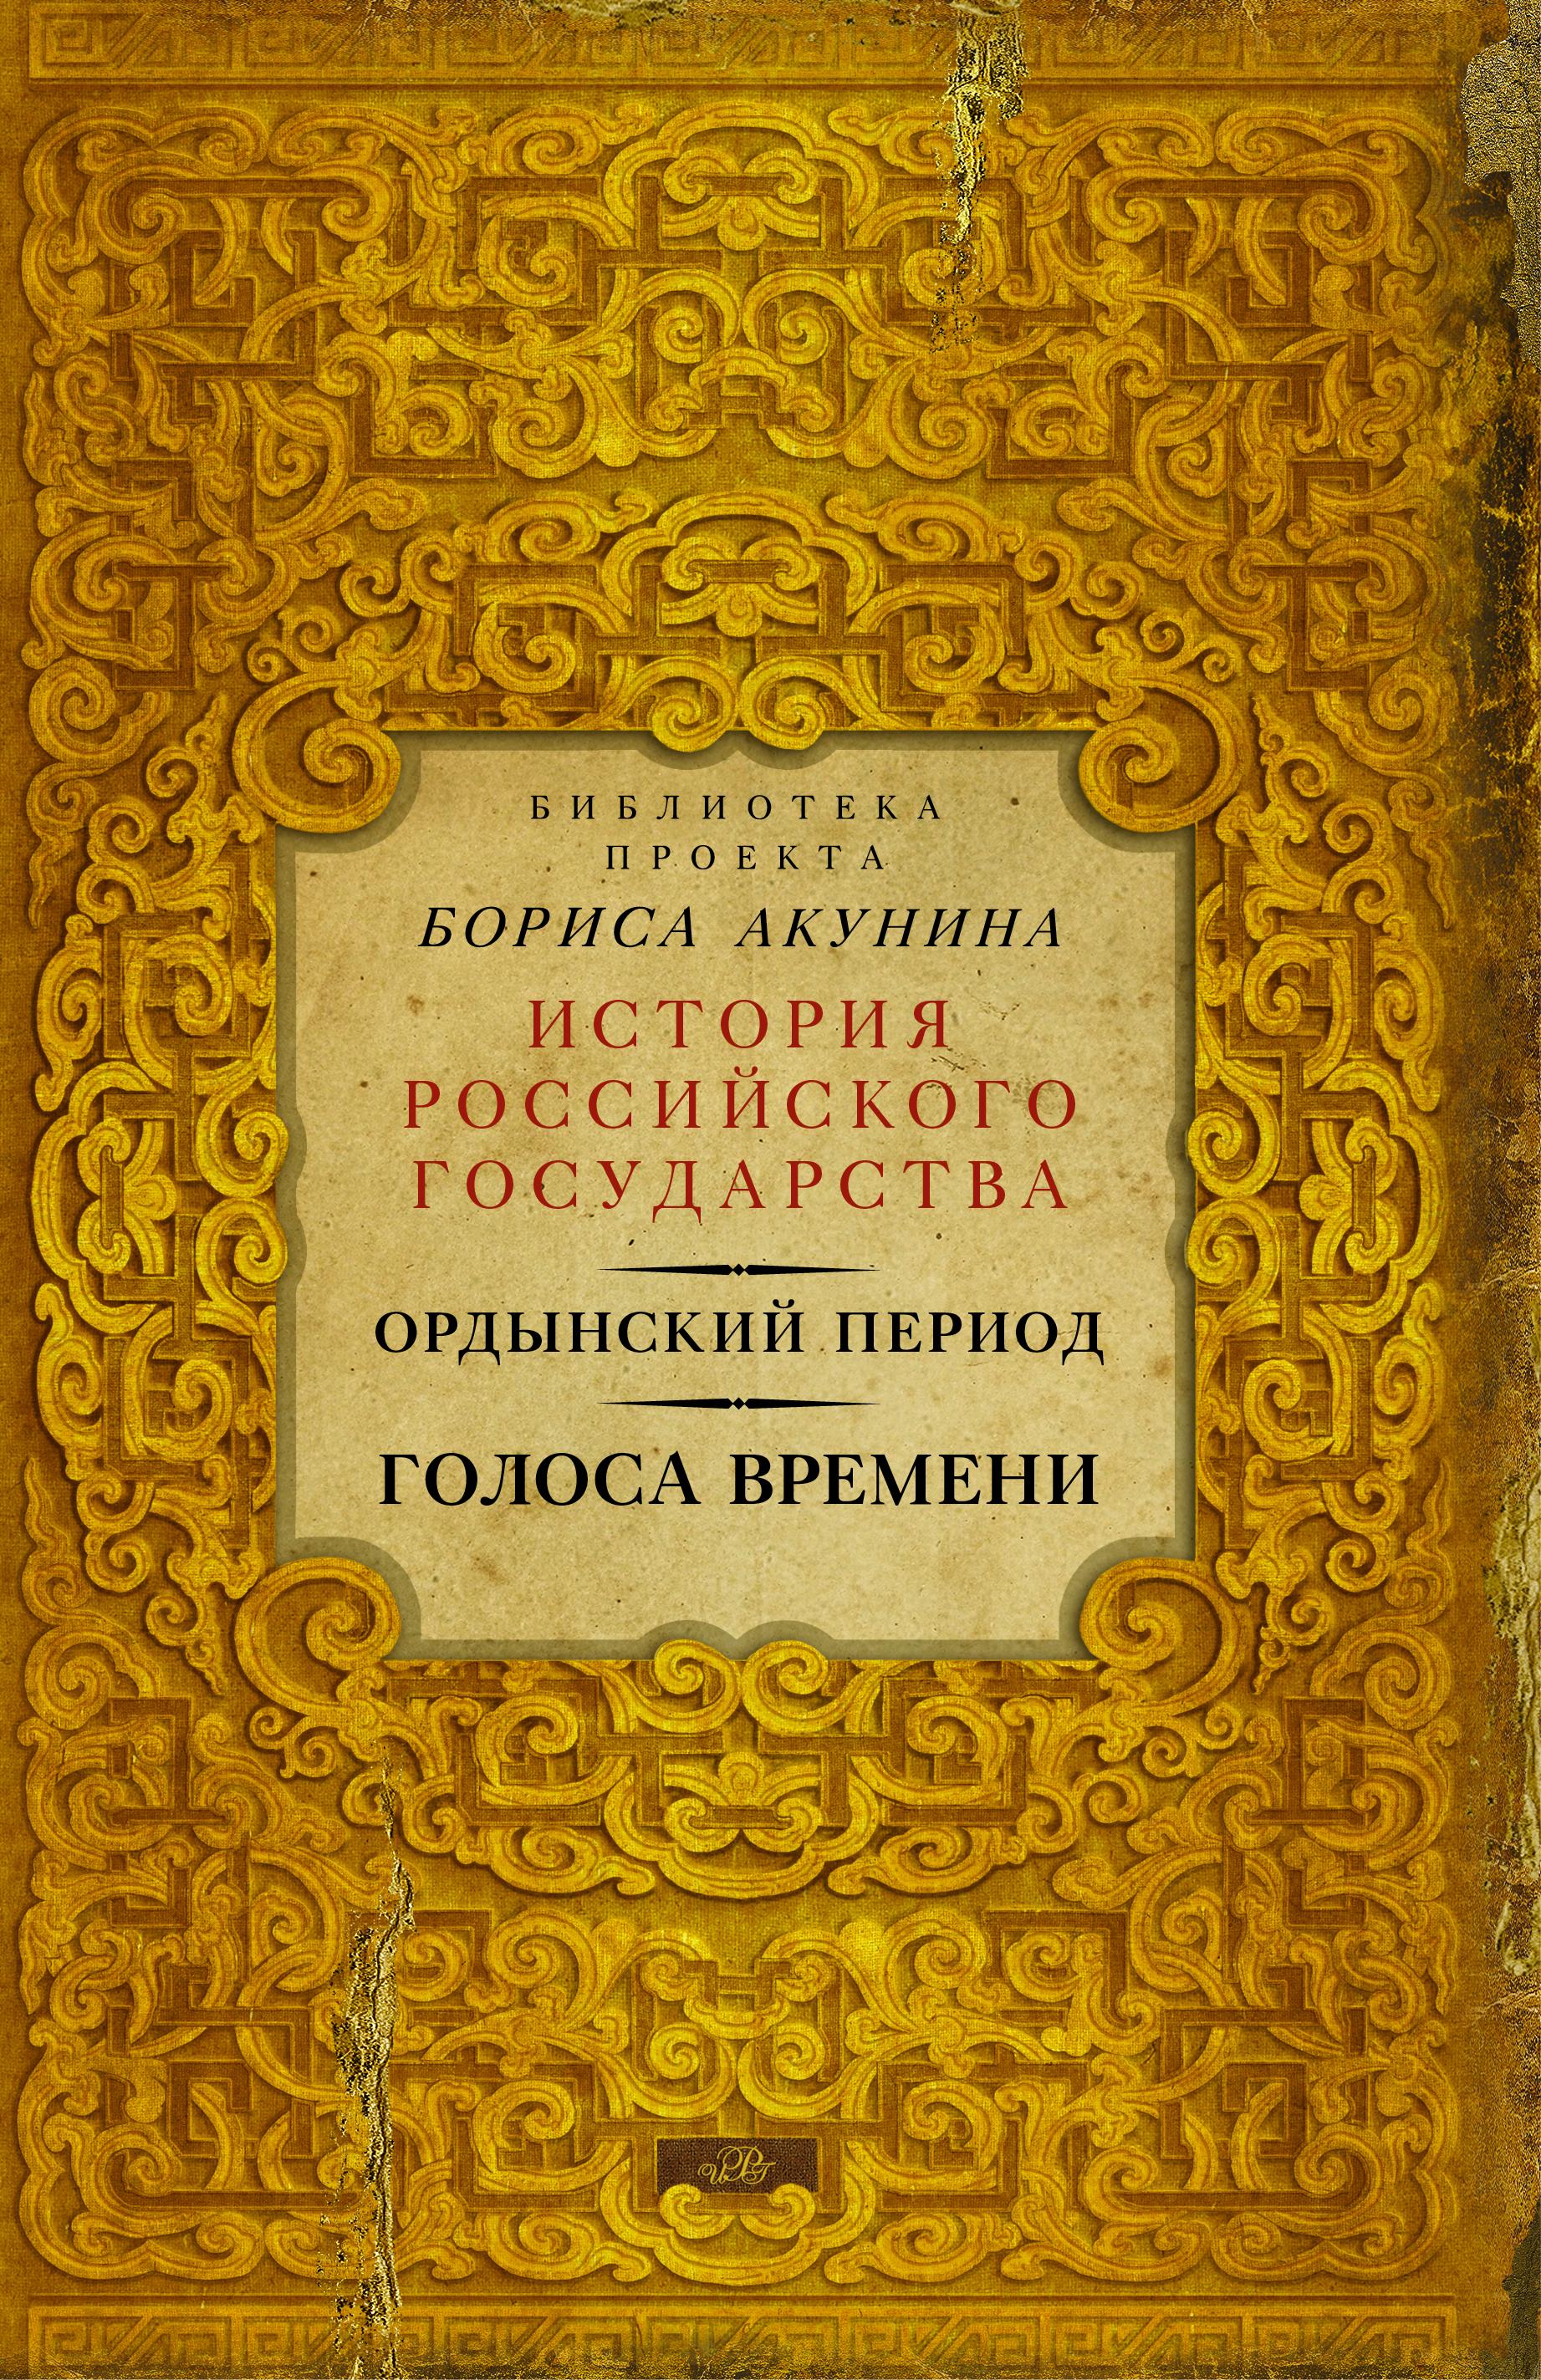 Борис Акунин Ордынский период: Голоса времени (библиотека проекта Бориса Акунина ИРГ)